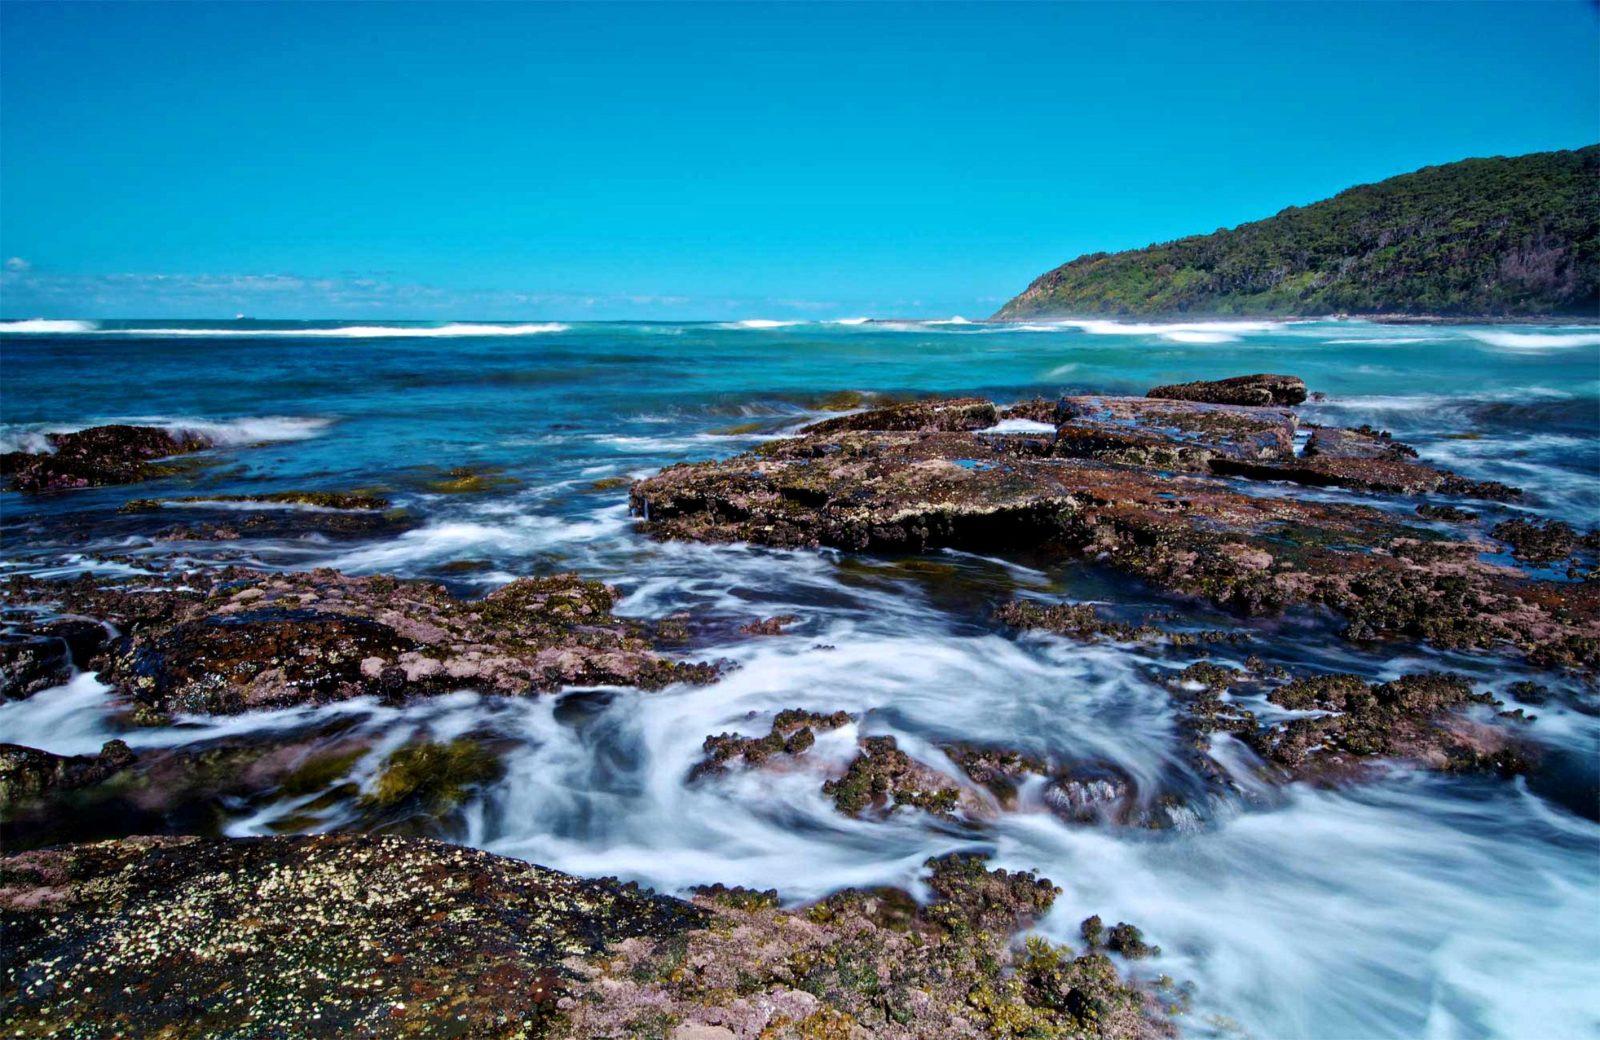 Rocks and water in Bateau Bay, Wyrrabalong National Park. Photo: John Spencer